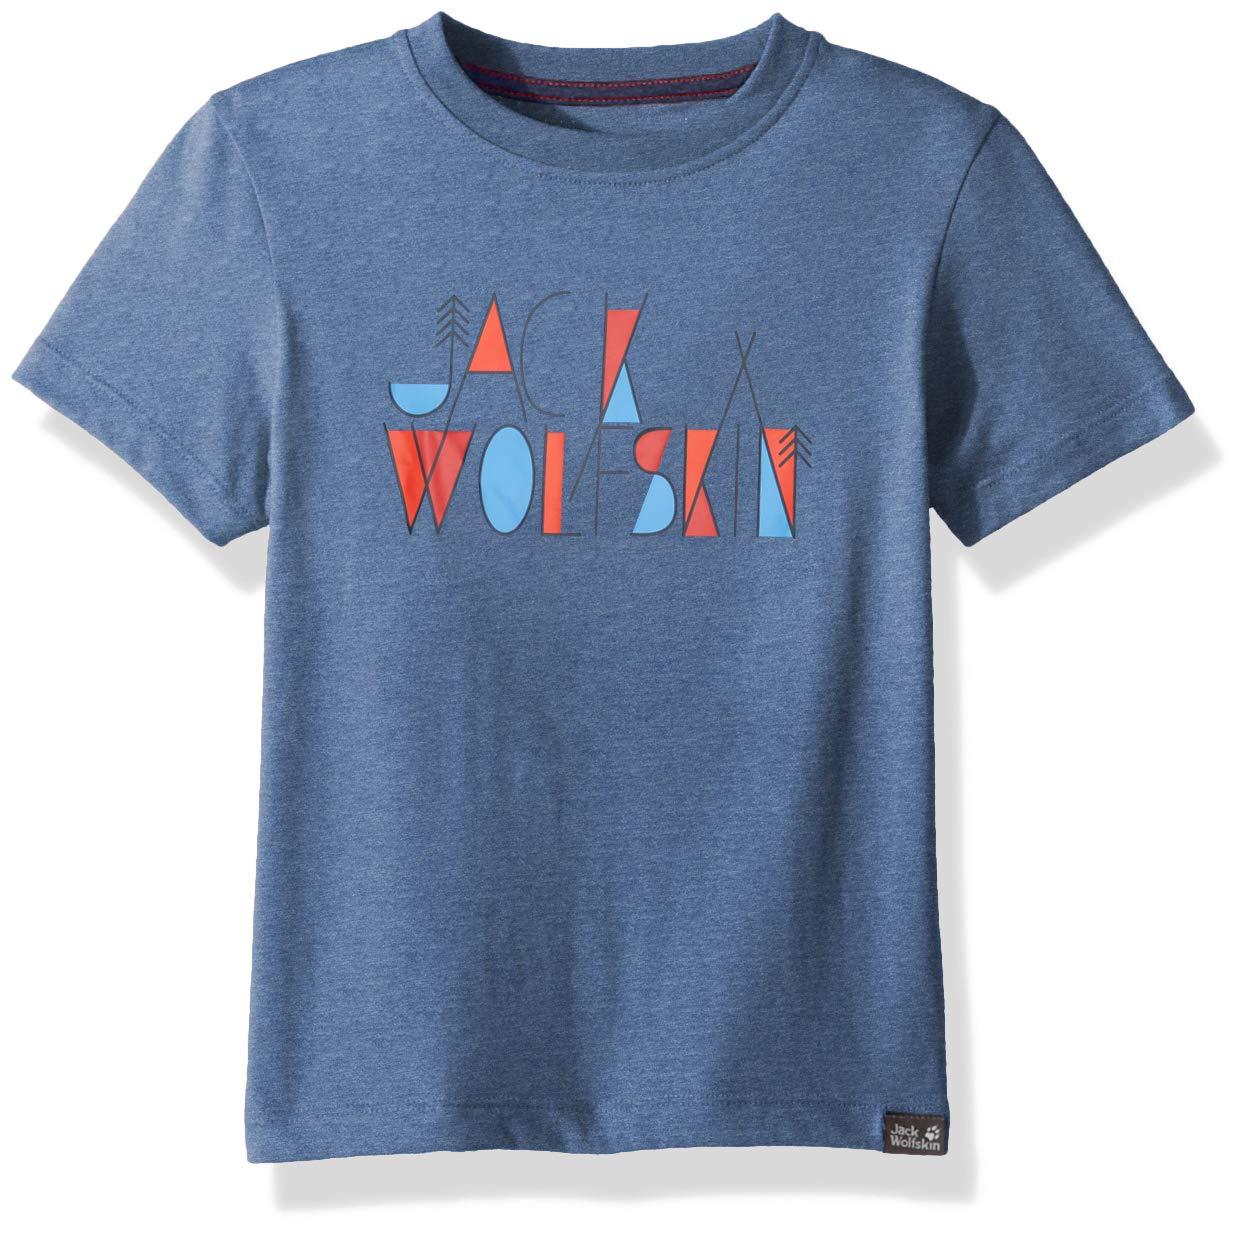 Jack Wolfskin Boy's Brand T T-Shirt Short Sleeve, 176 (14 Years & Older), Ocean Wave by Jack Wolfskin